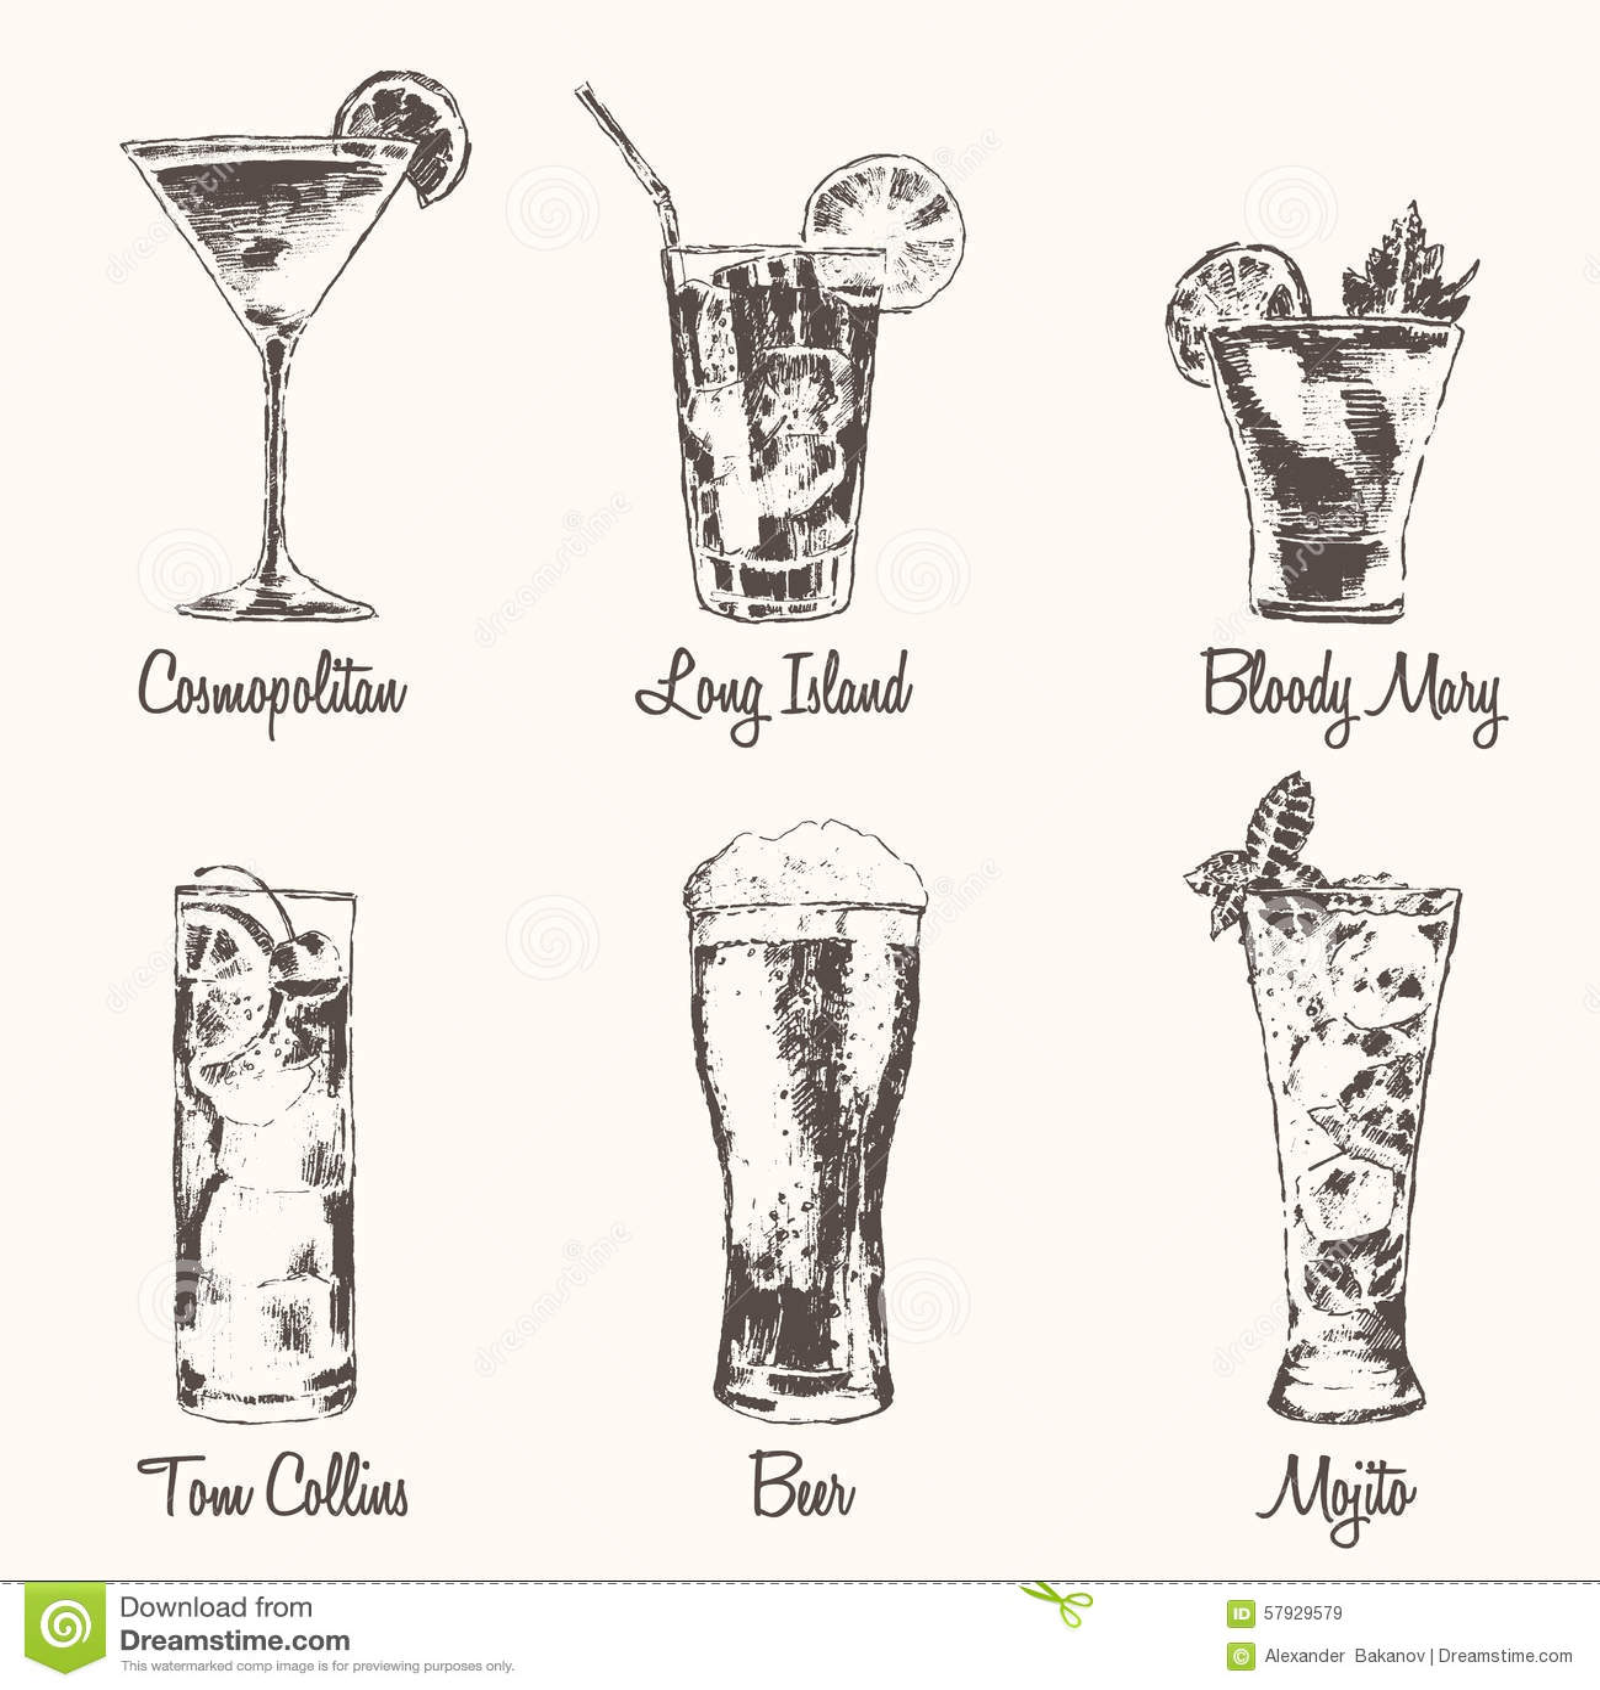 Cocktail menu template free download